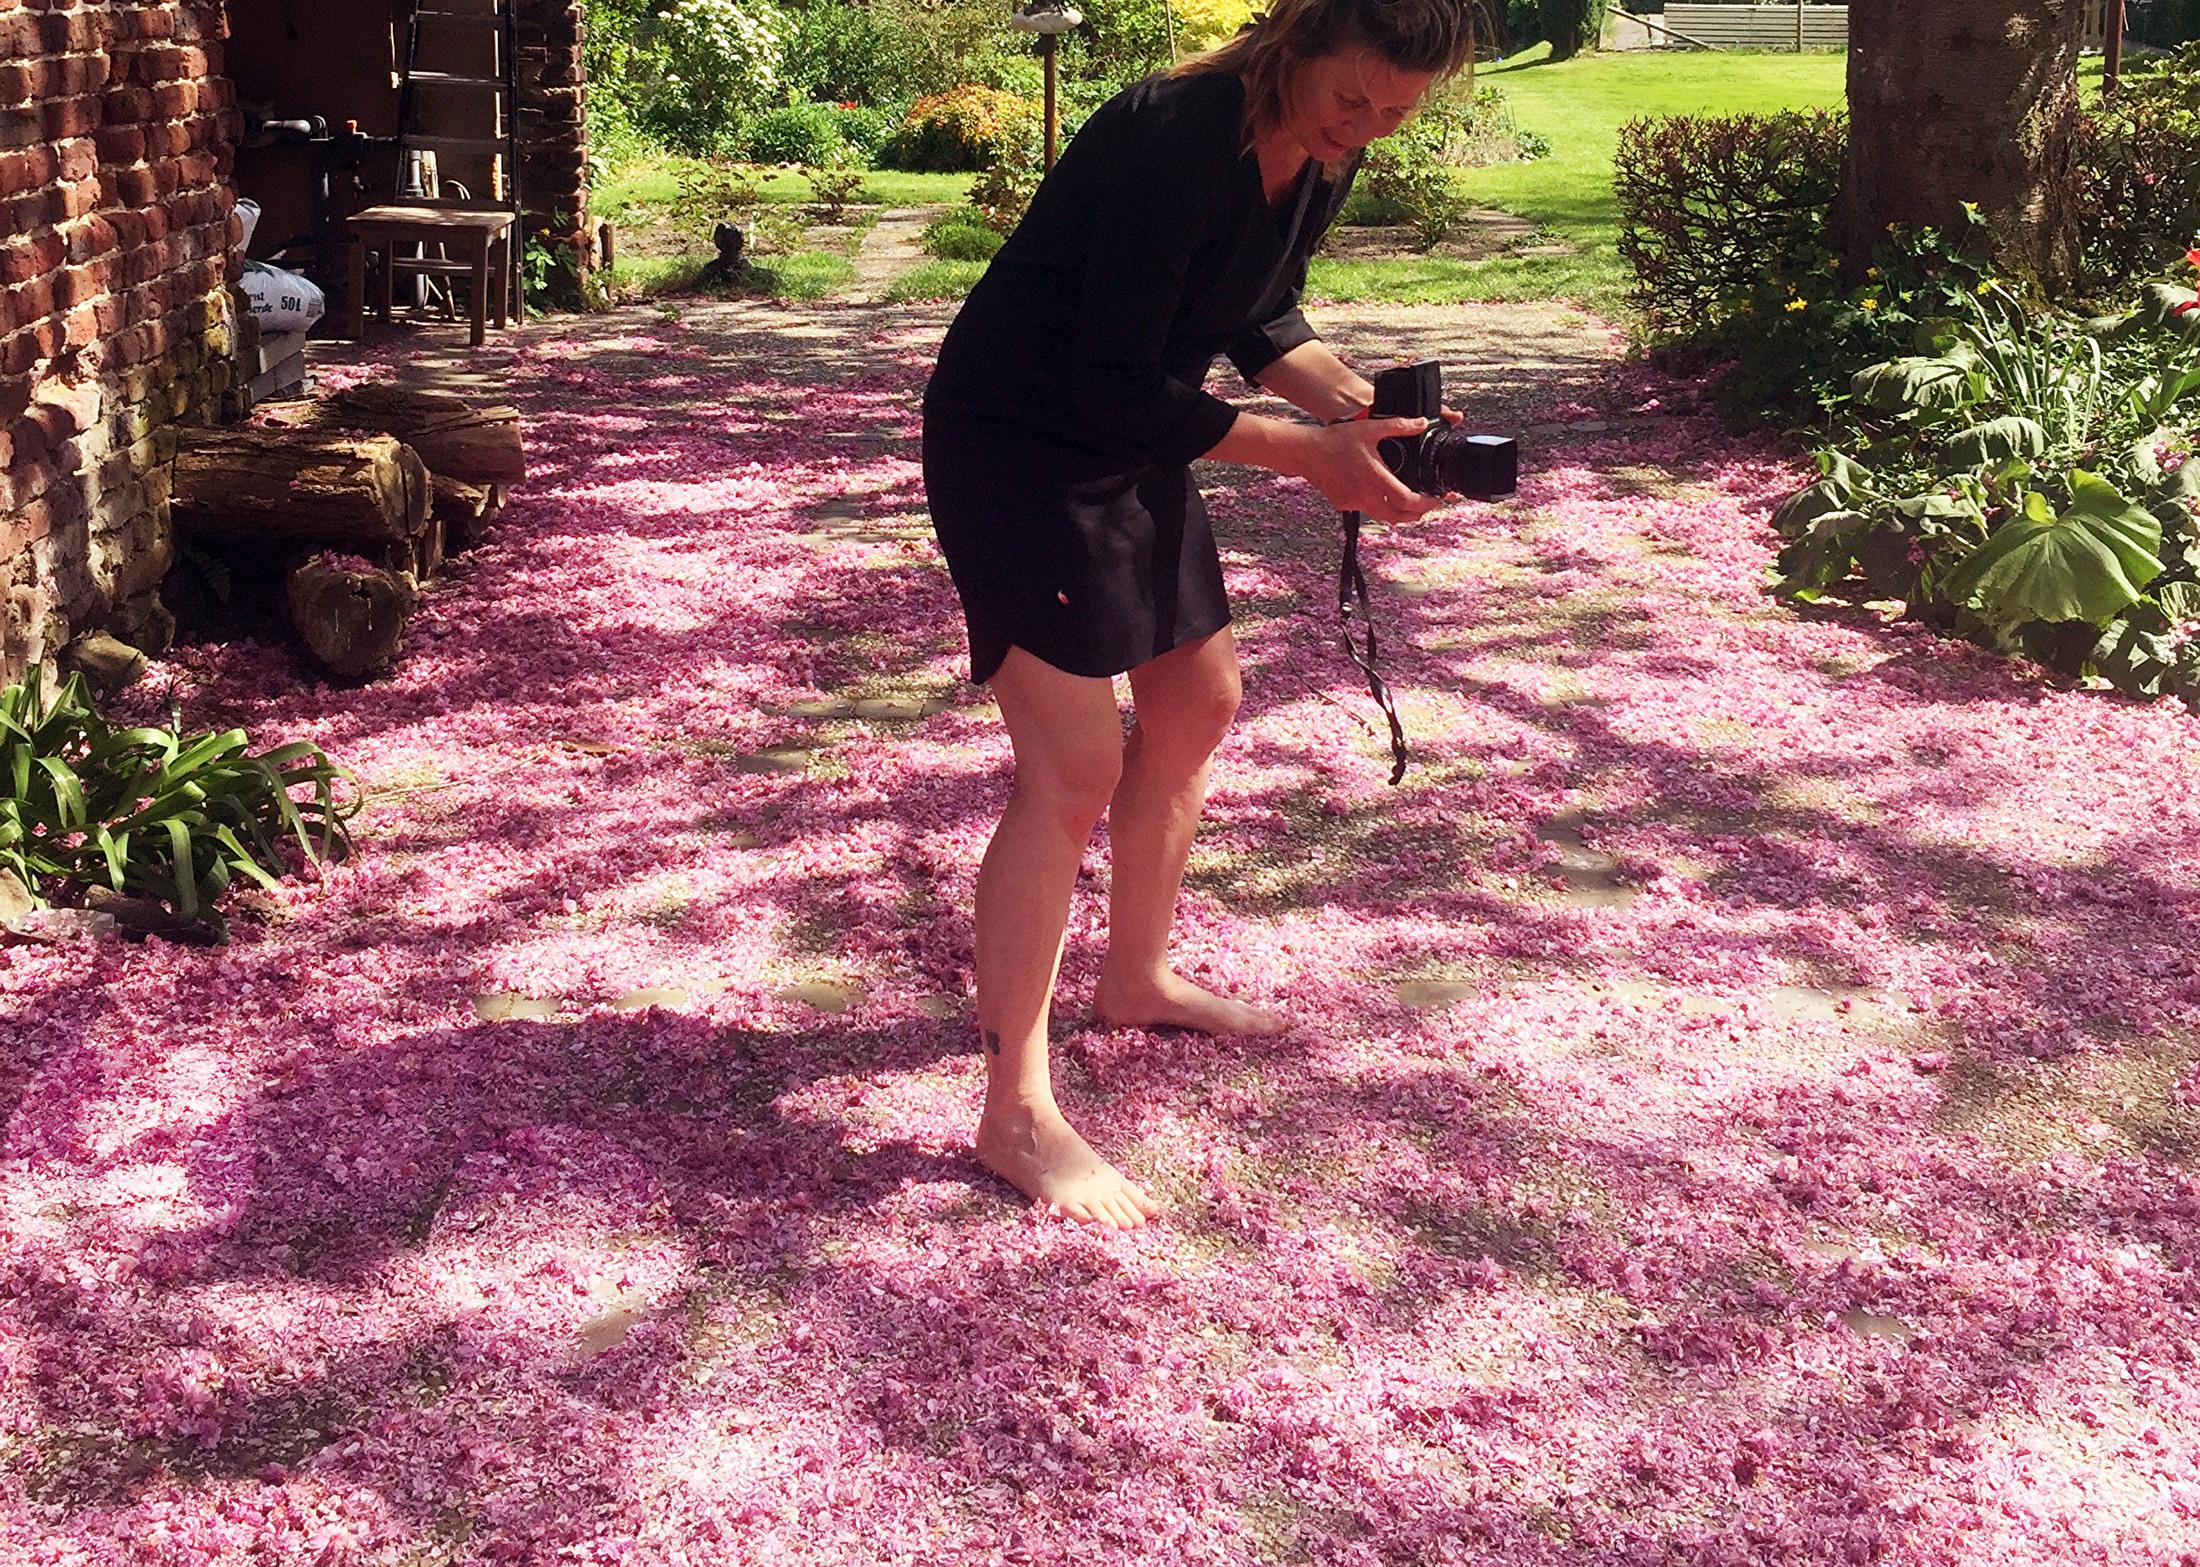 blossom_homegarden